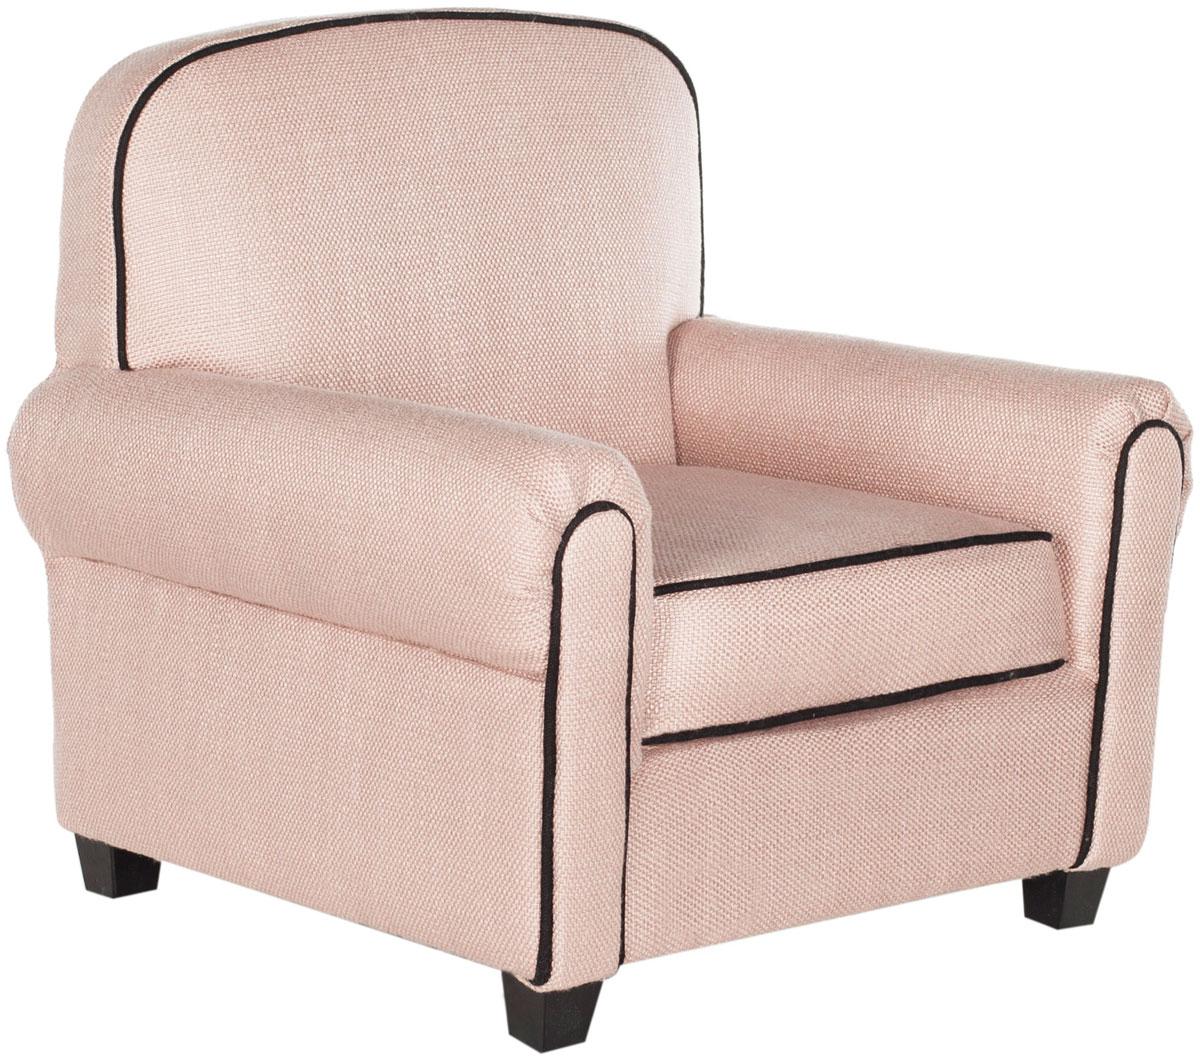 Kid1001b Kid S Accent Chairs Kids Furniture By Safavieh